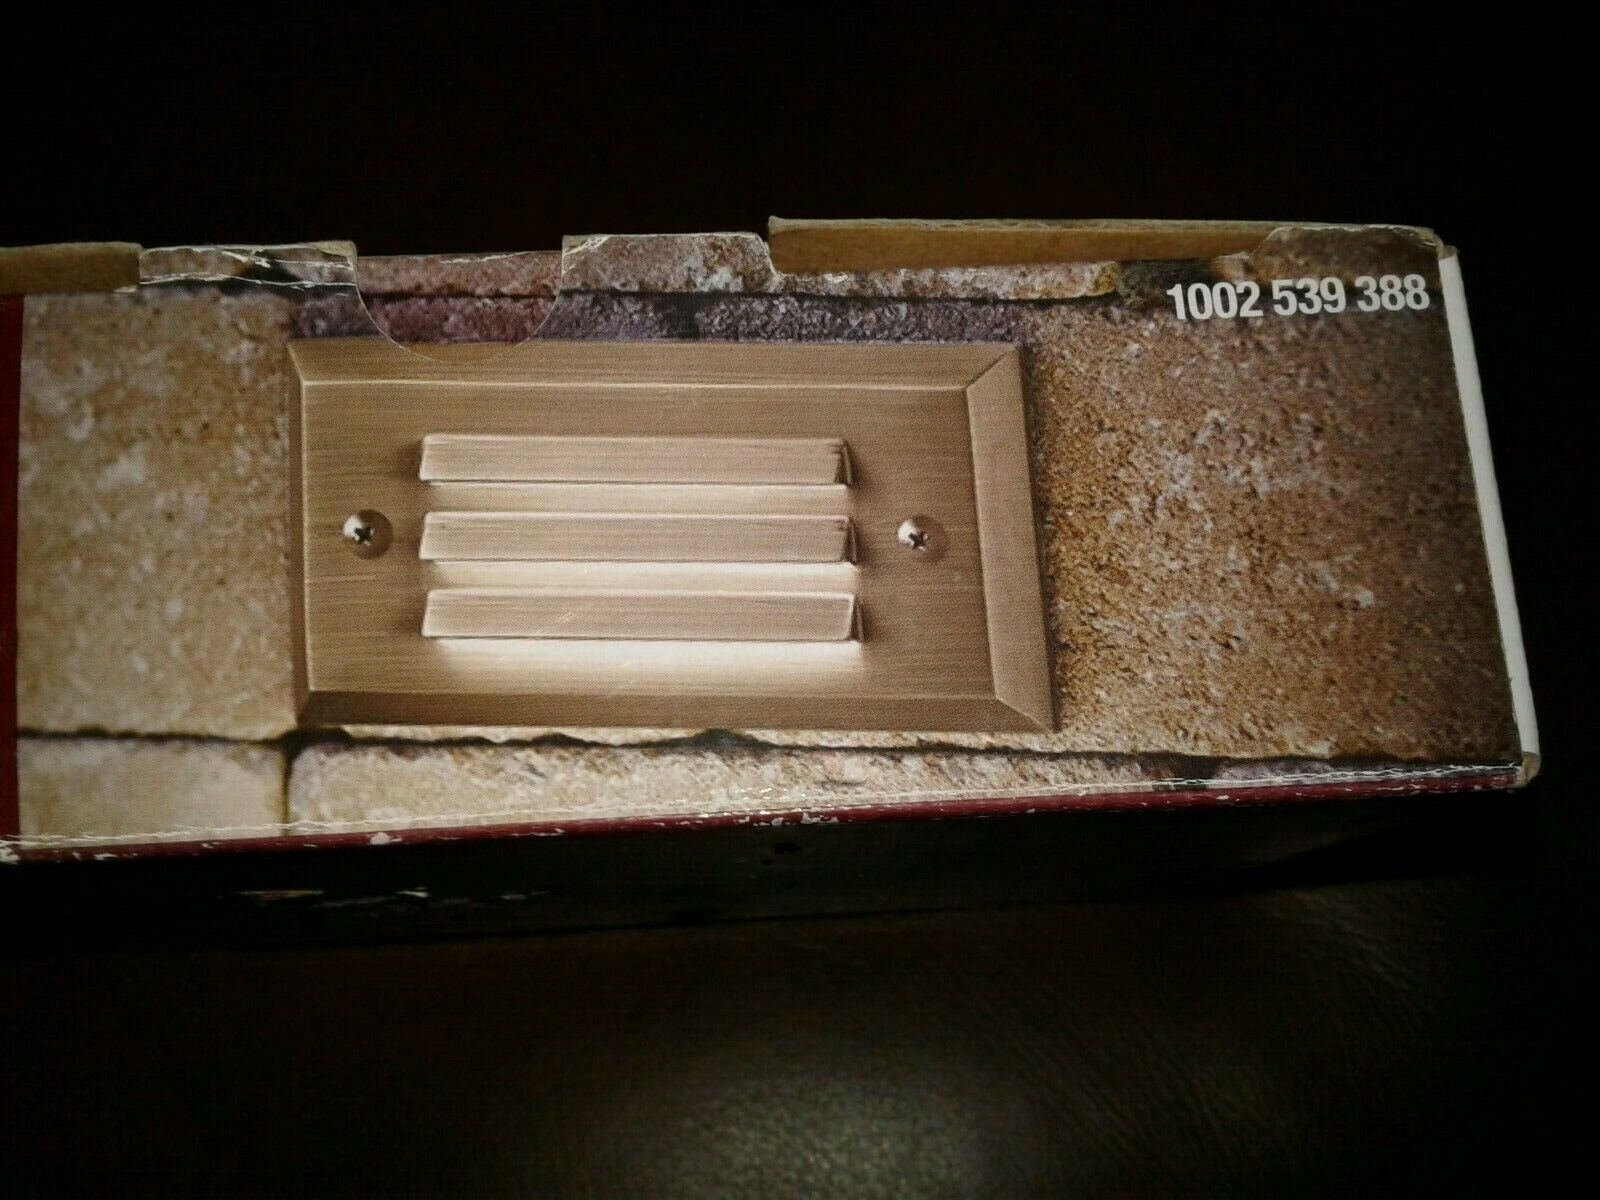 Home Decorators Collection Led Deck Step Light 1002539388 Brass Bronze 2 Watt For Sale Online